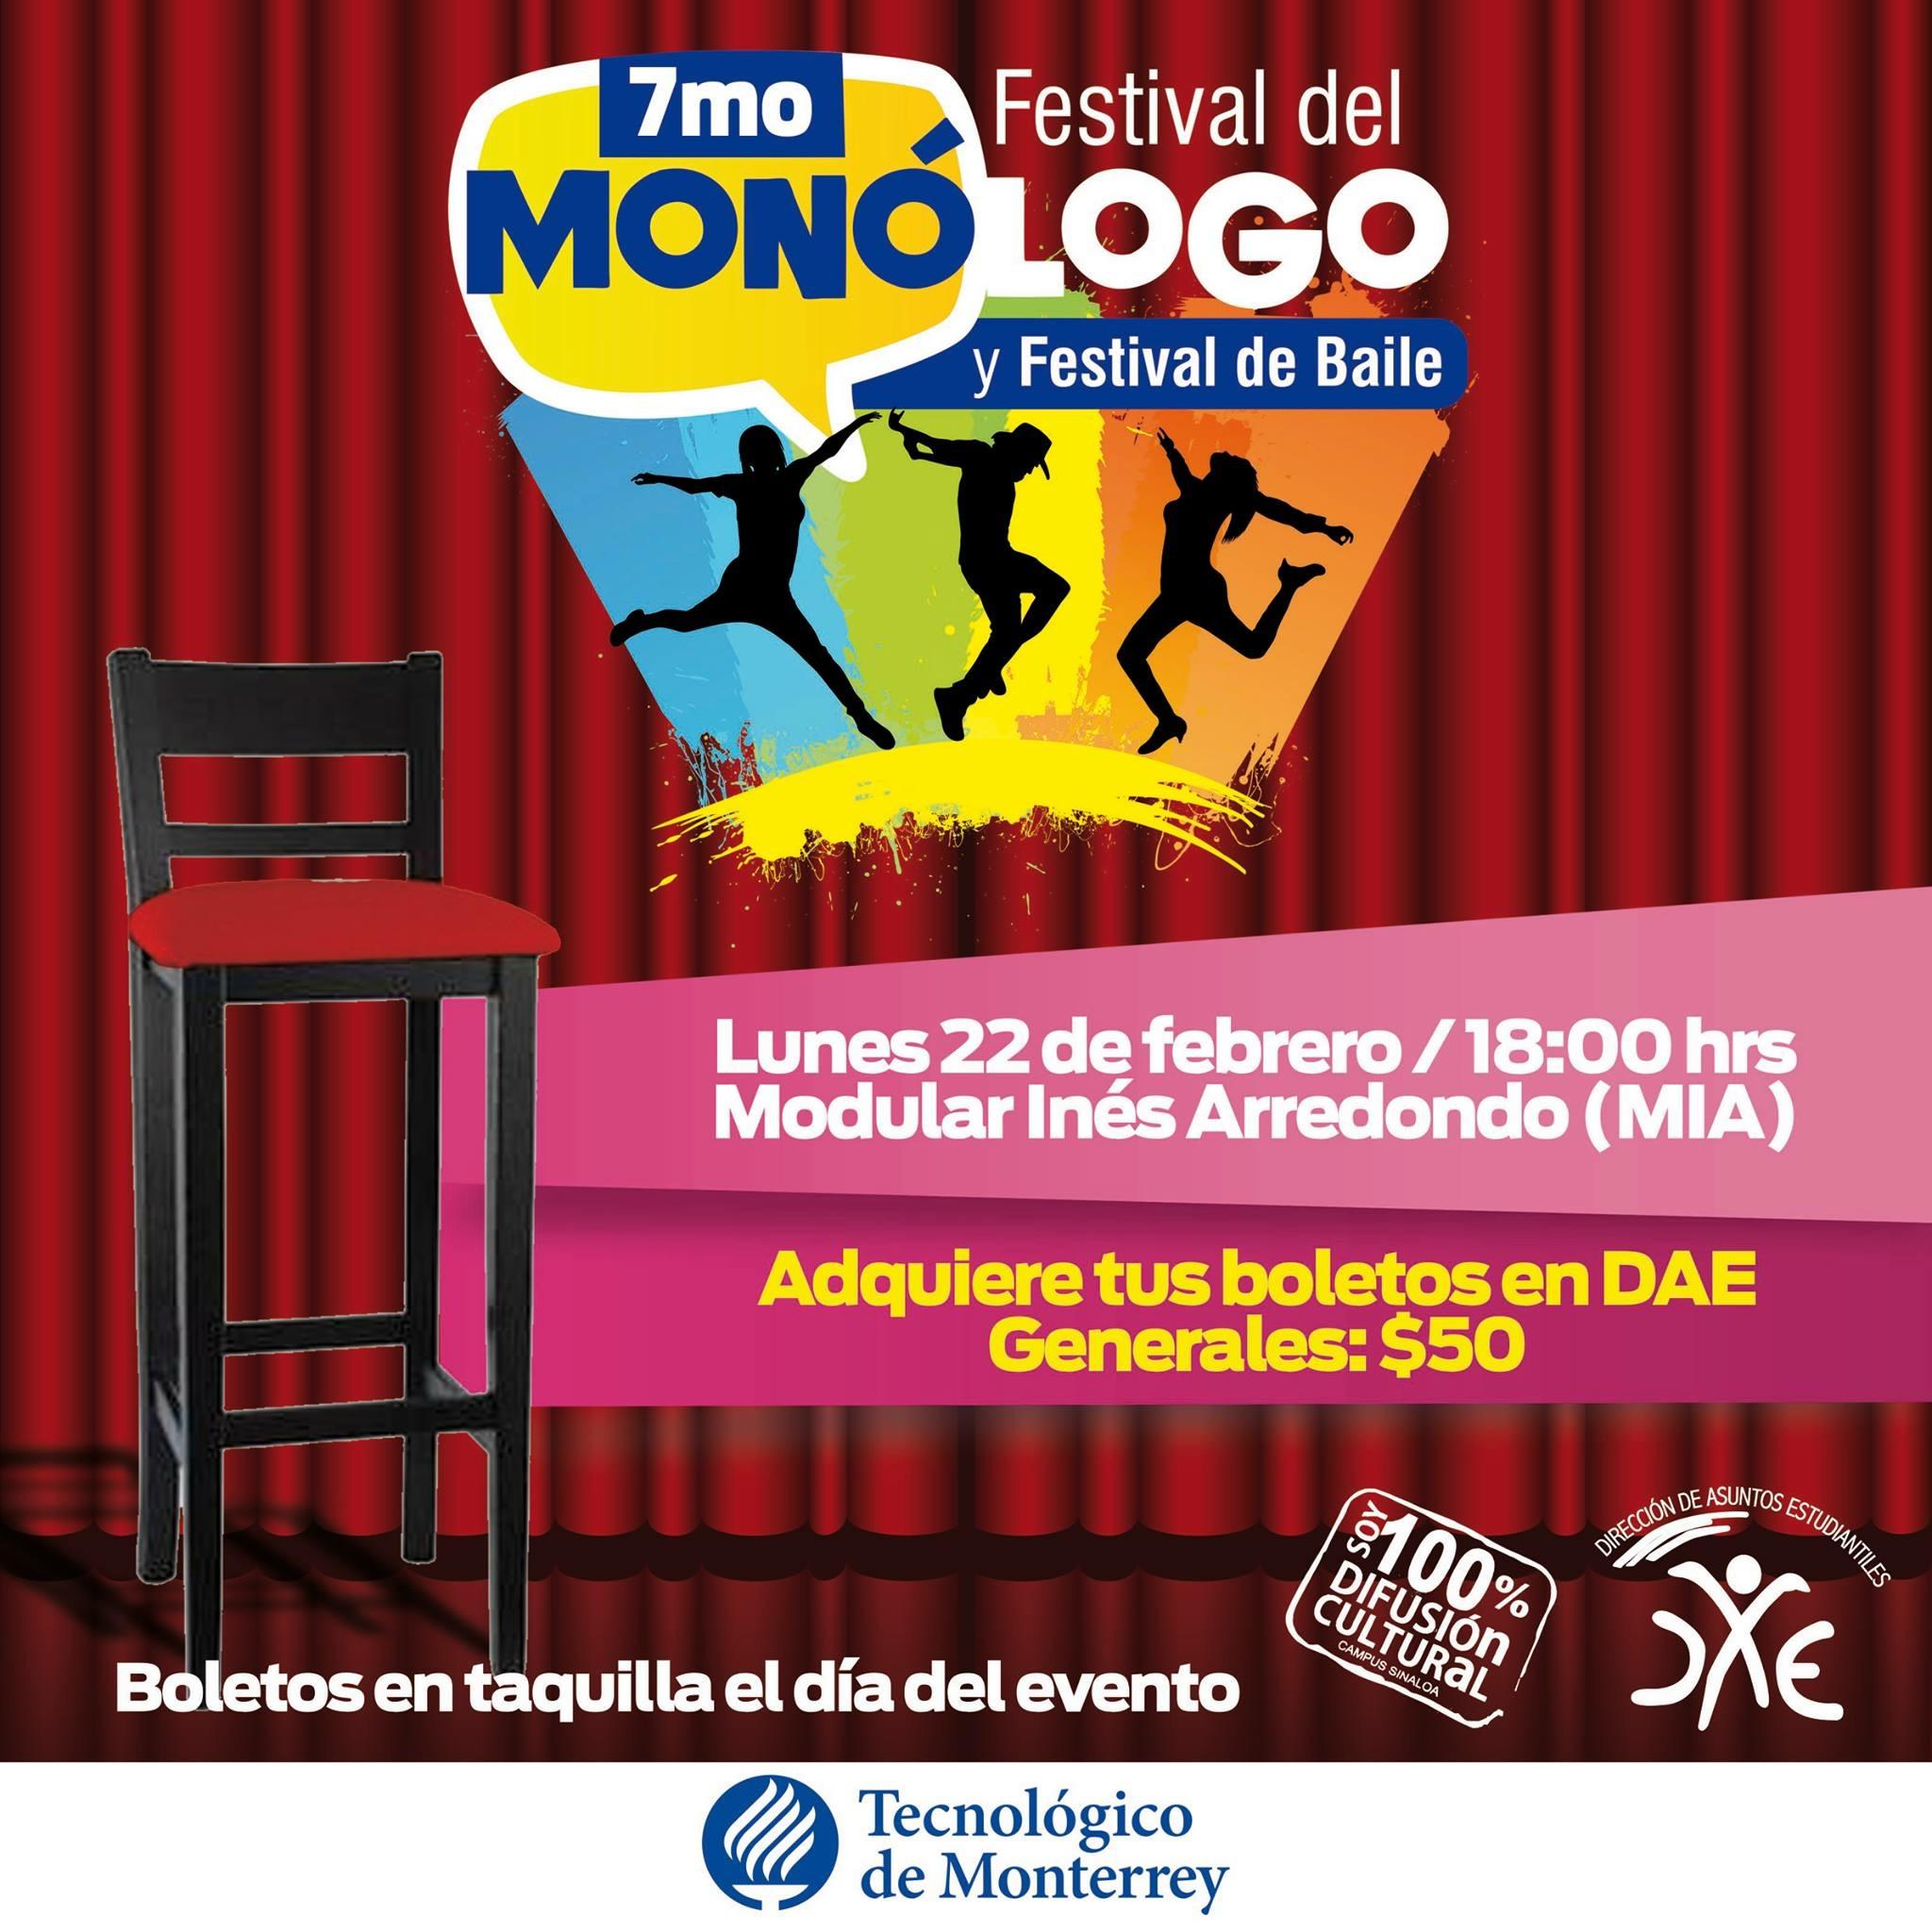 febrero22-festivaldelmonologo